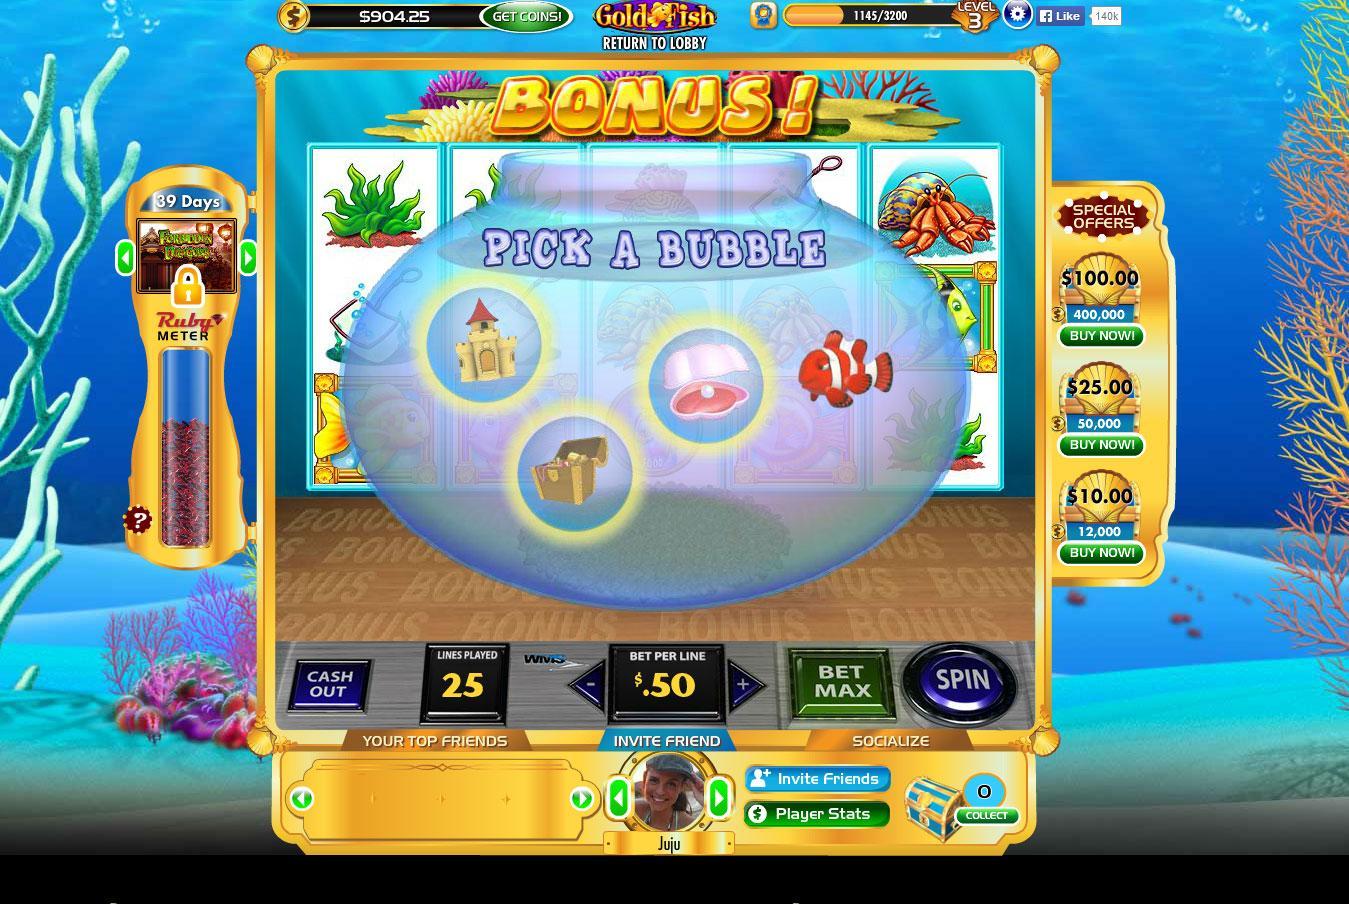 Gold fish casino slots slots bingo games for Gold fish casino